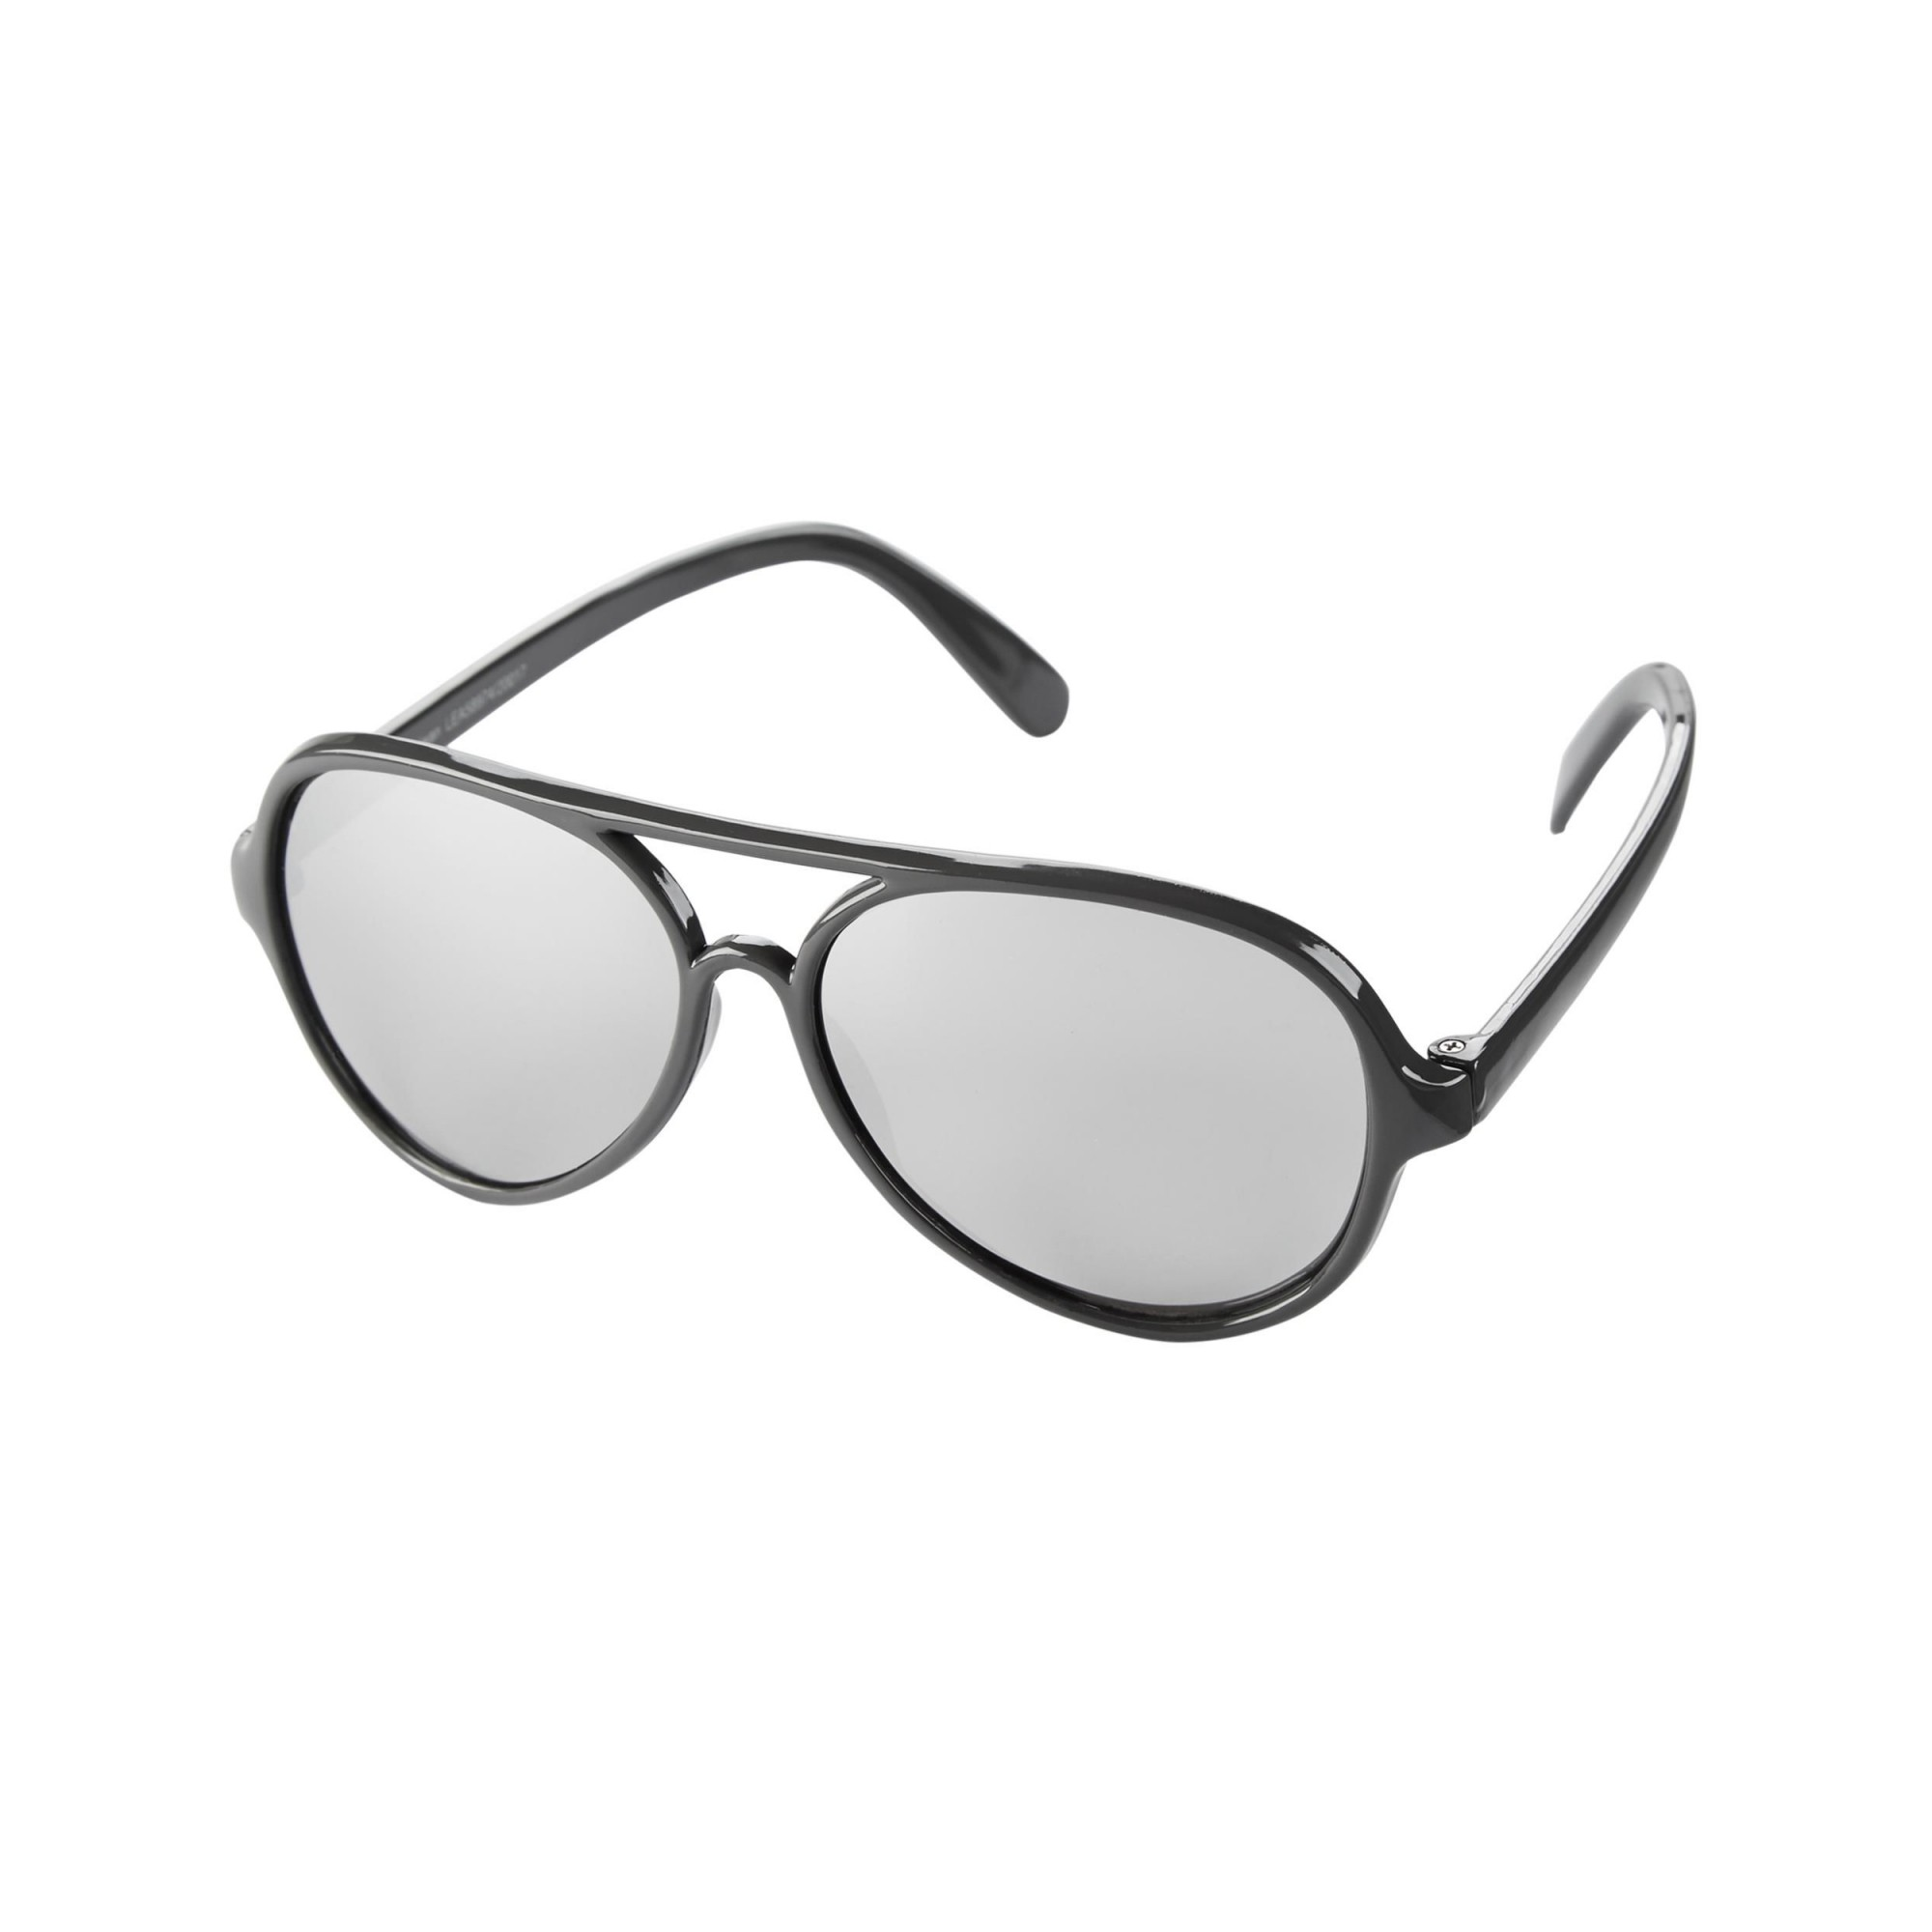 Oculos de Sol Carters Masculino - Tam 0-24 meses - Vitrine Baby 5b00c3c64d